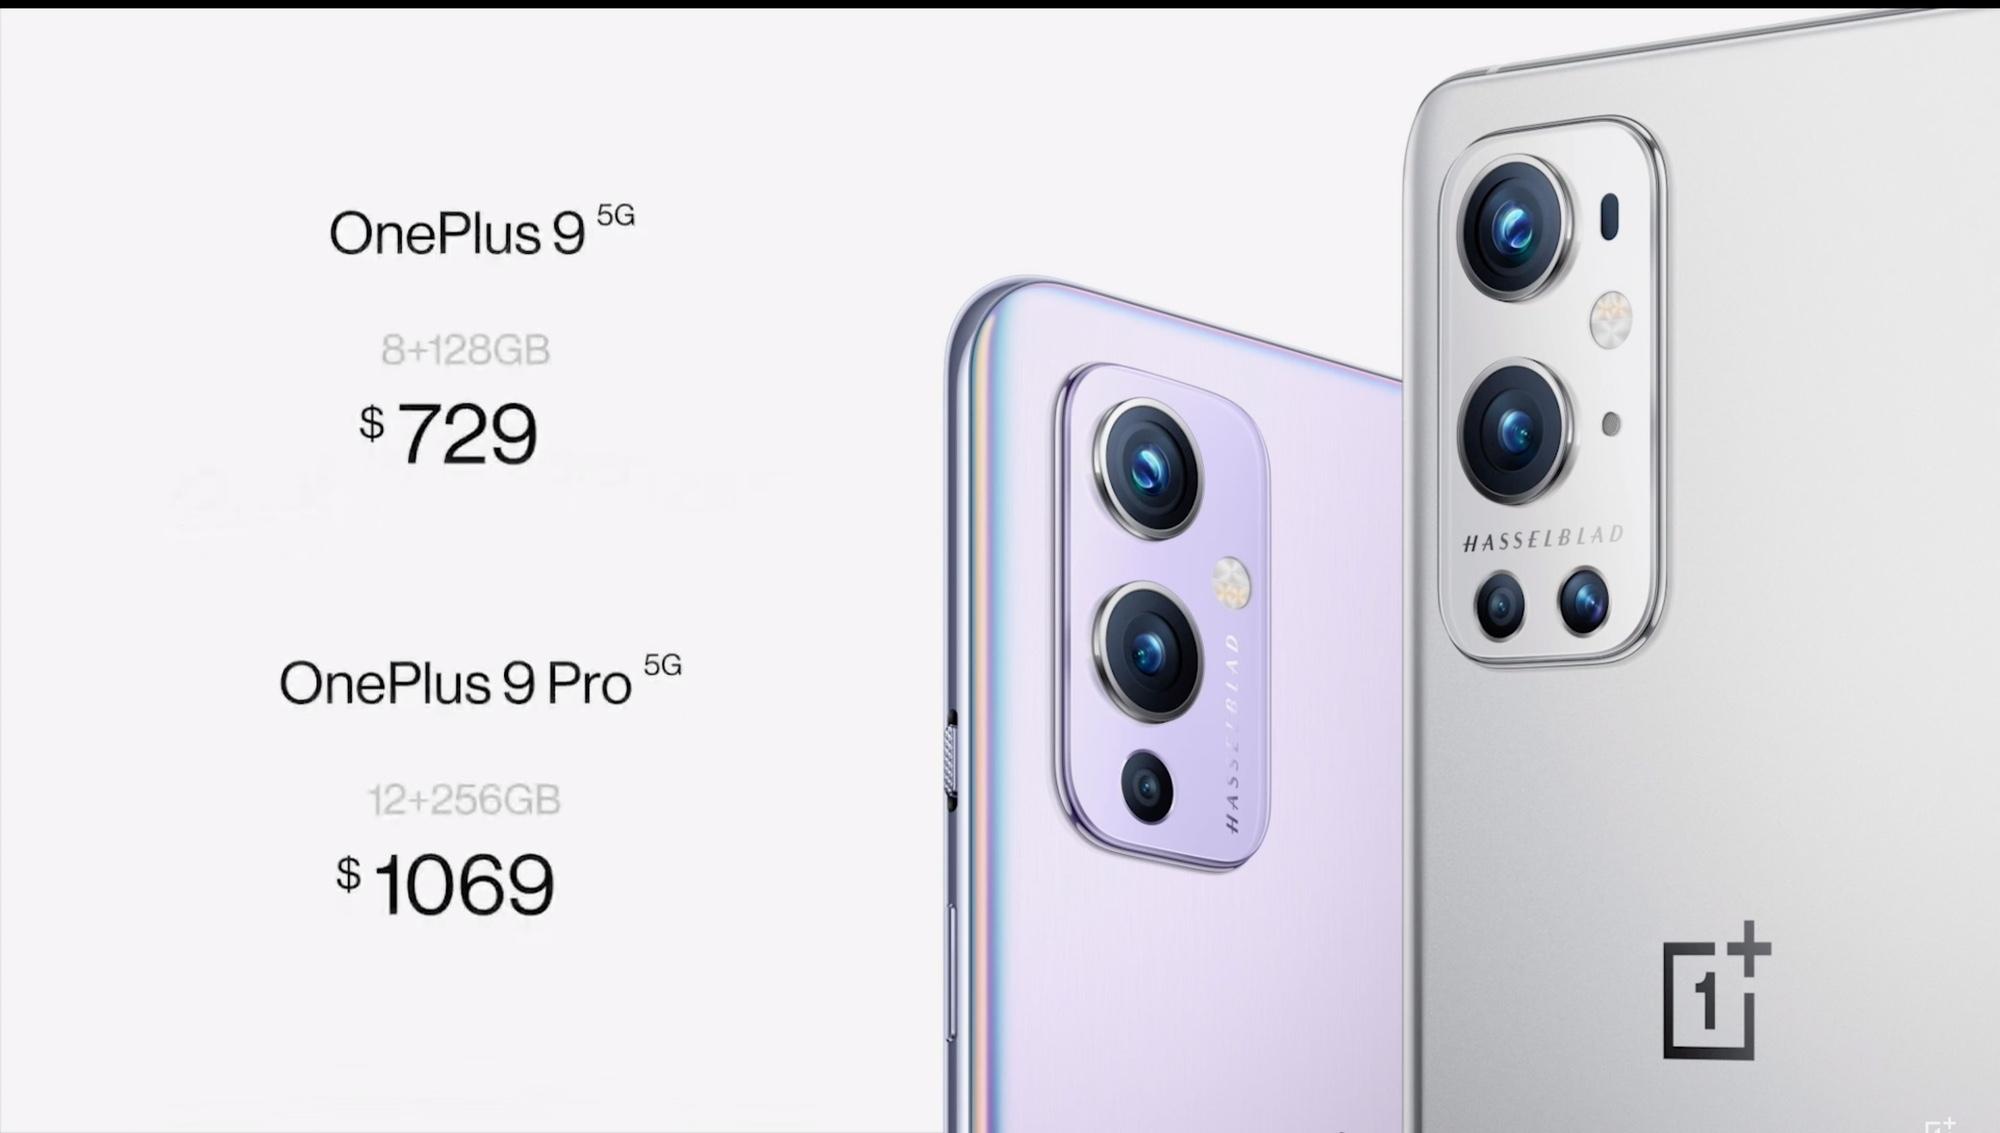 oneplus 9 pricing